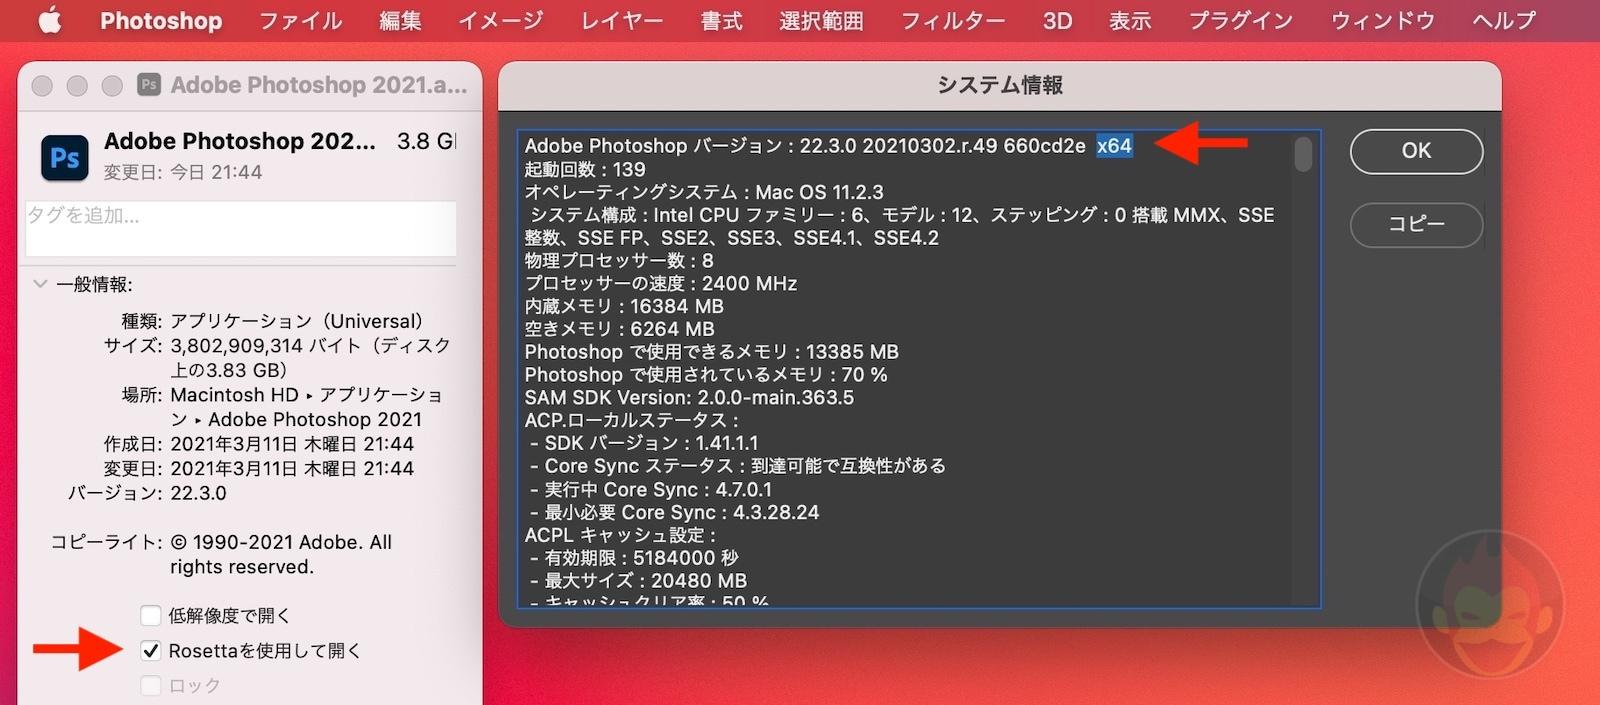 Adobe Photoshop How to run Native or Rosetta 02